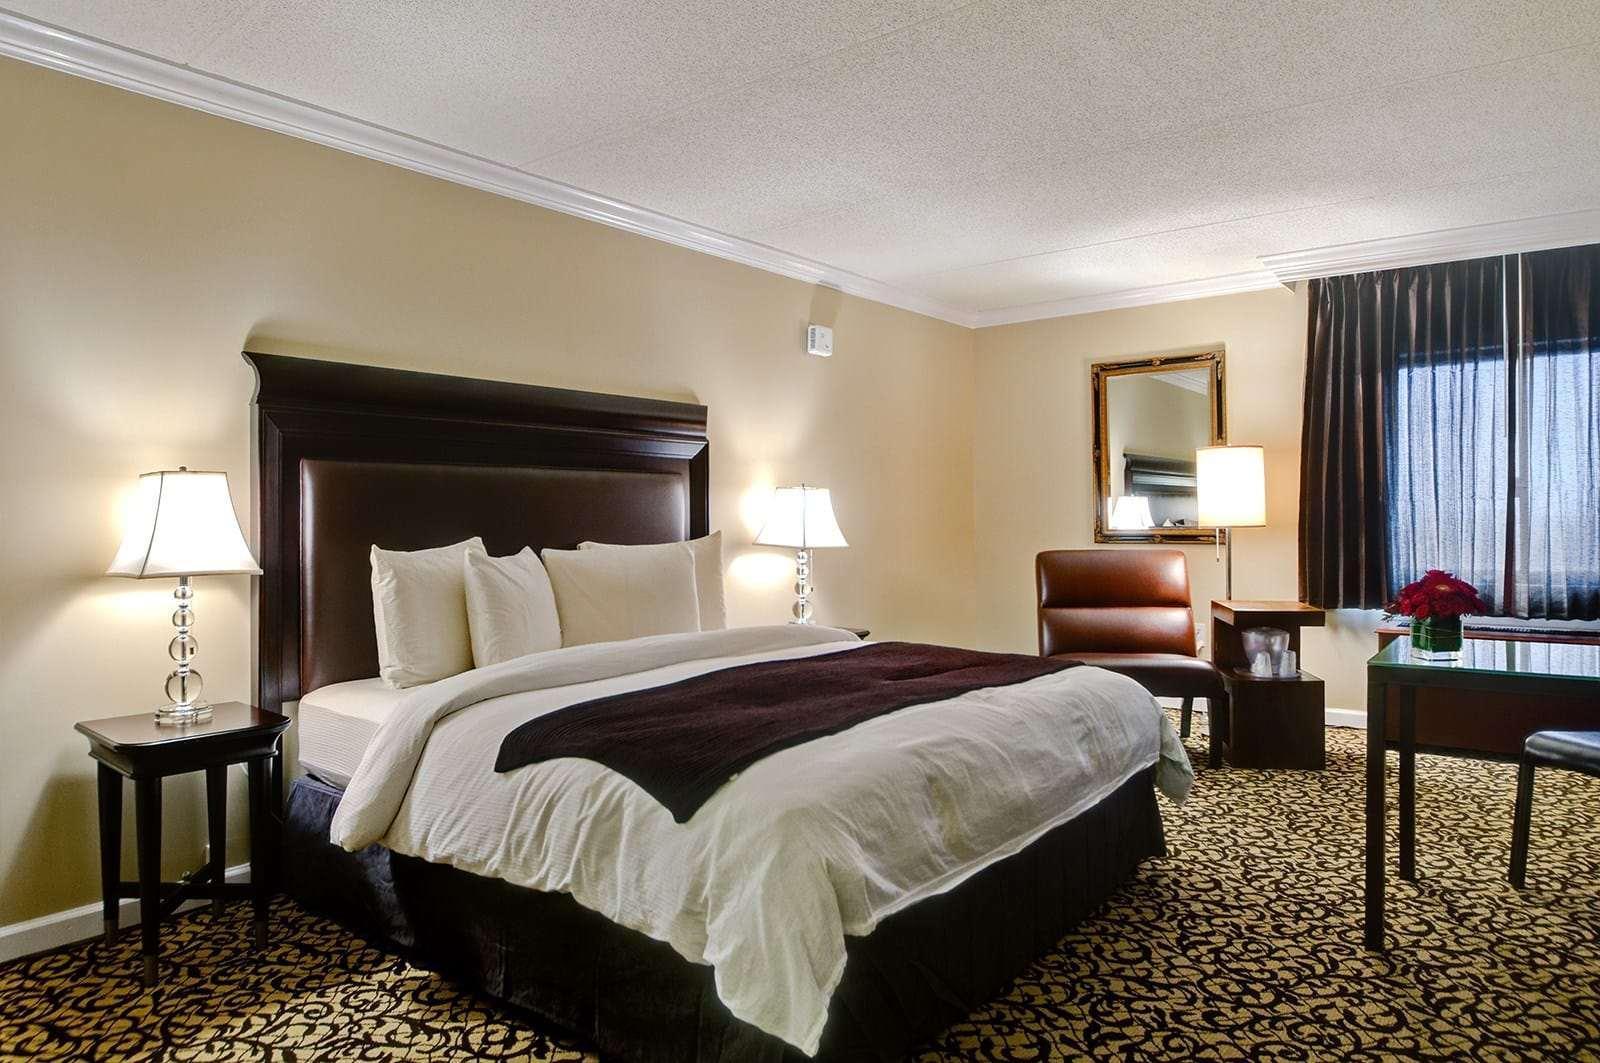 Kirkley Hotel, A Trademark Collection Hotel, Lynchburg